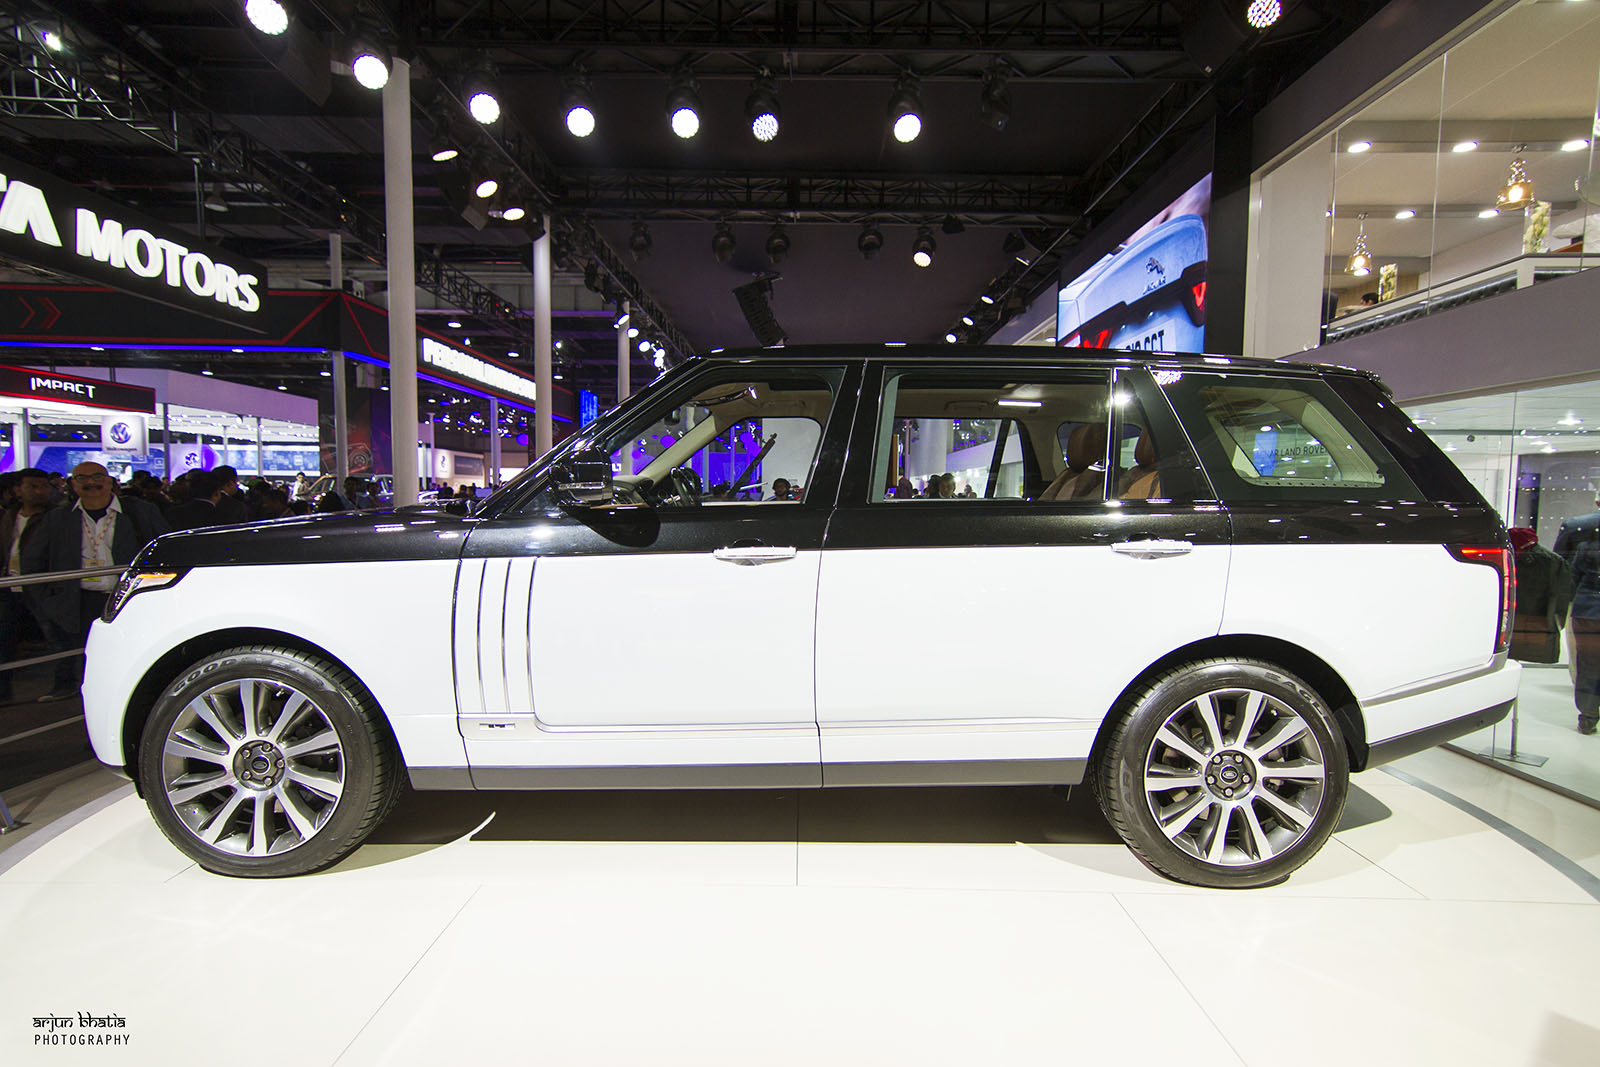 Range Rover SV Autobiography Delhi Auto Expo 2016 1